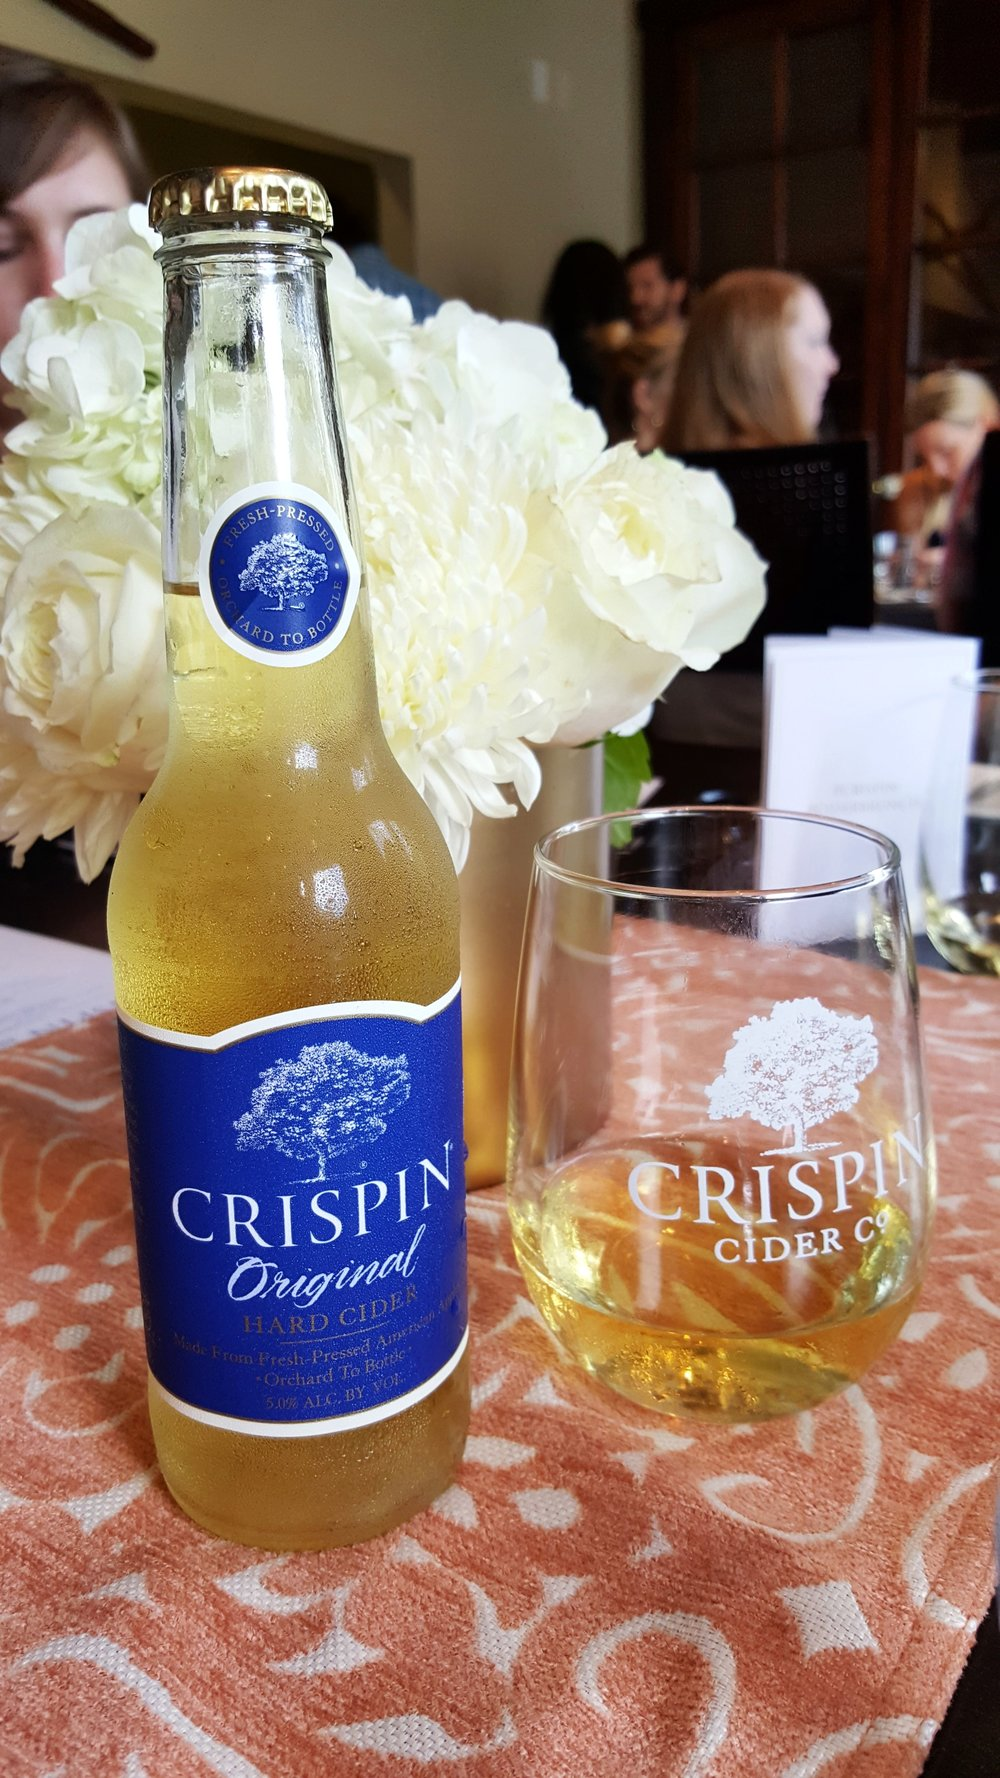 Crispin' Original